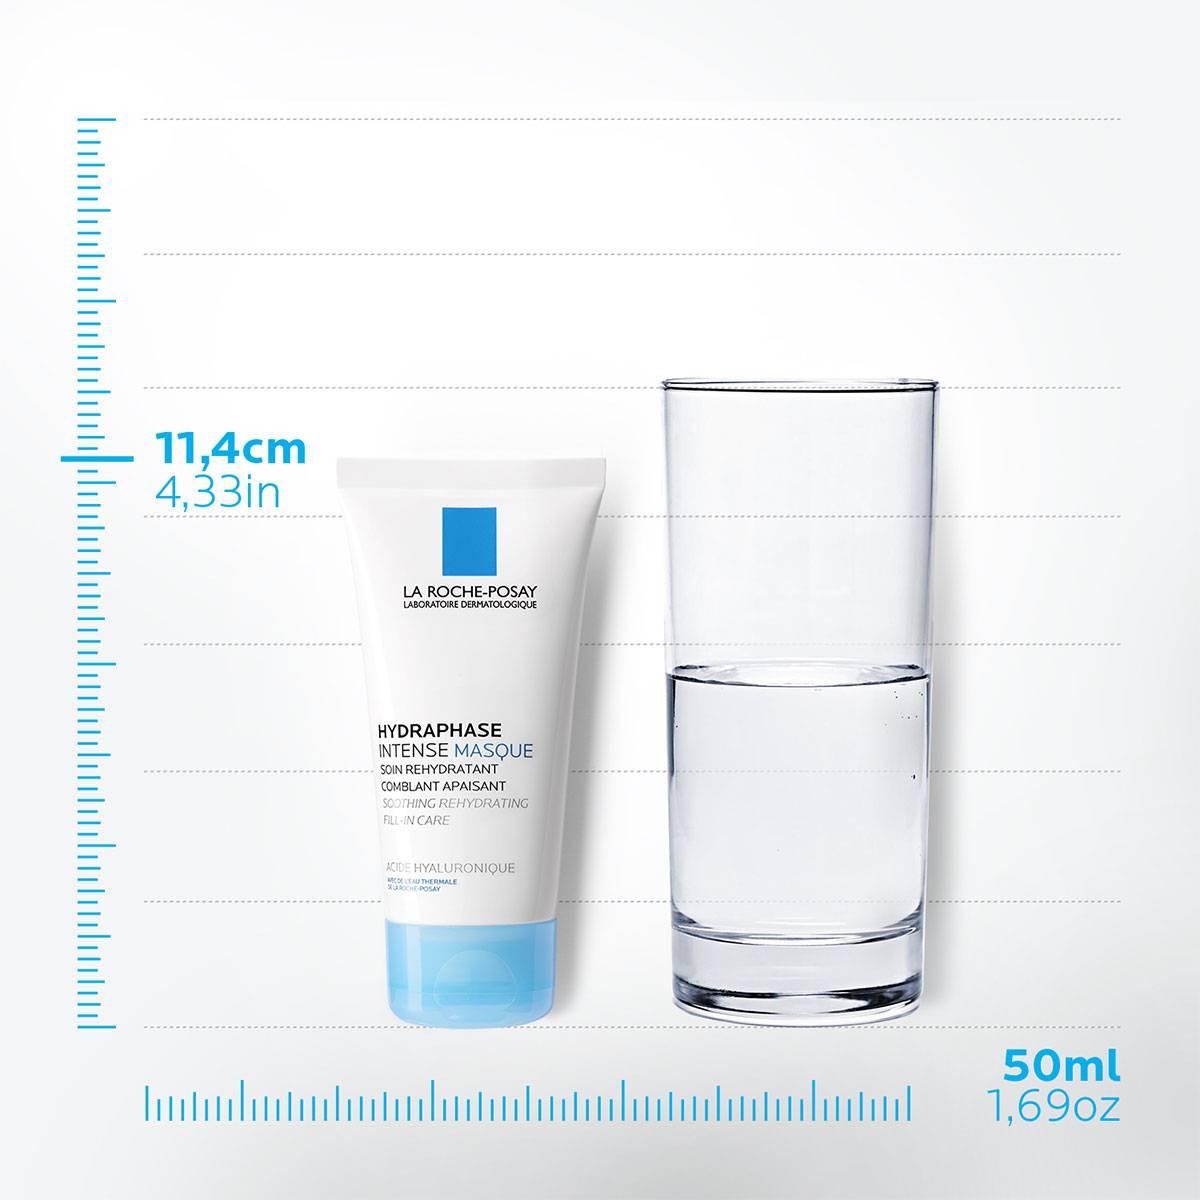 La Roche Posay ProductPage Hydraphase Intense Masque 50ml 333787241307